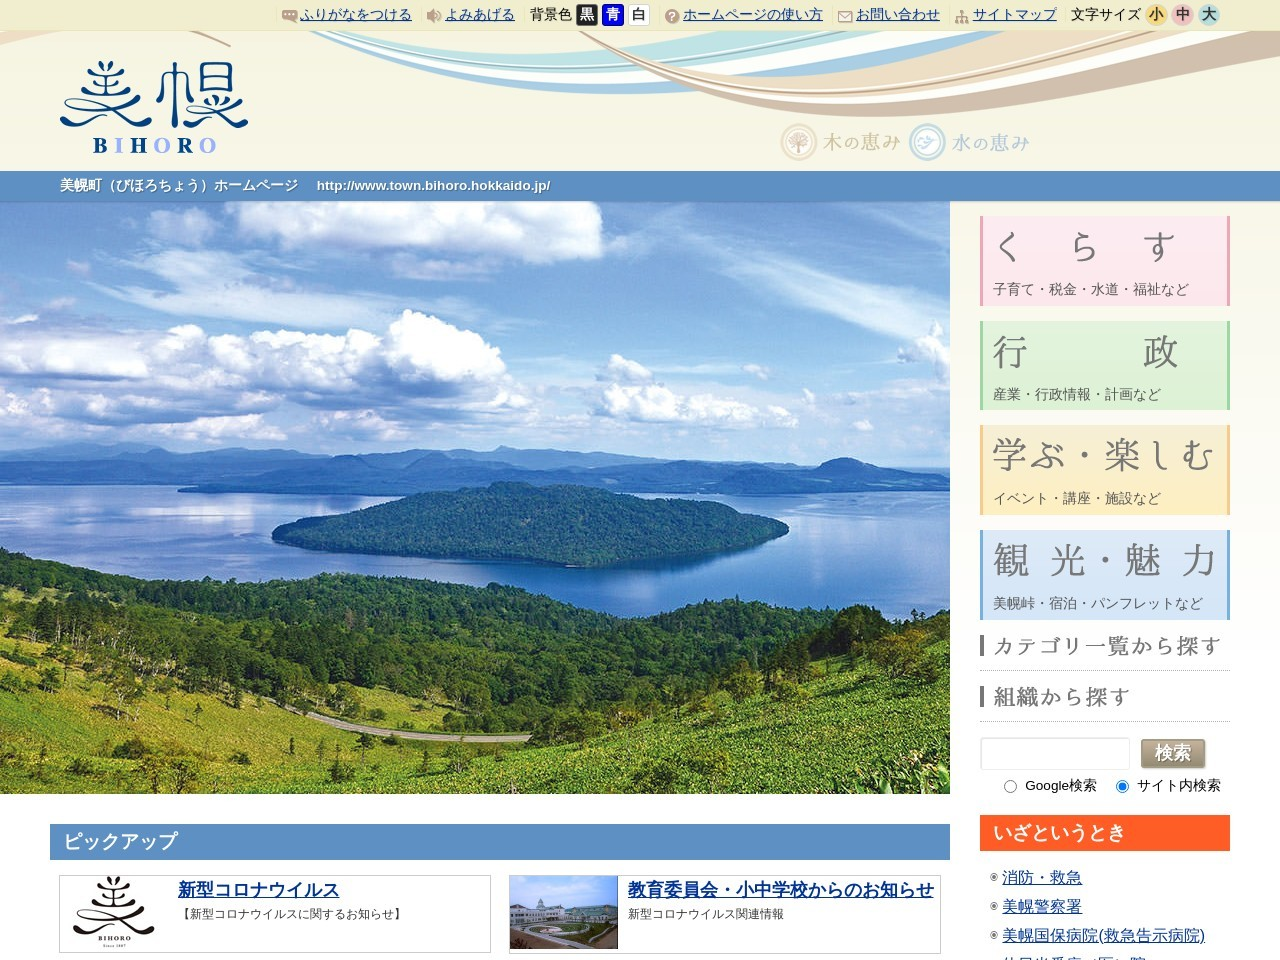 http://www.town.bihoro.hokkaido.jp/docs/2019020100025/